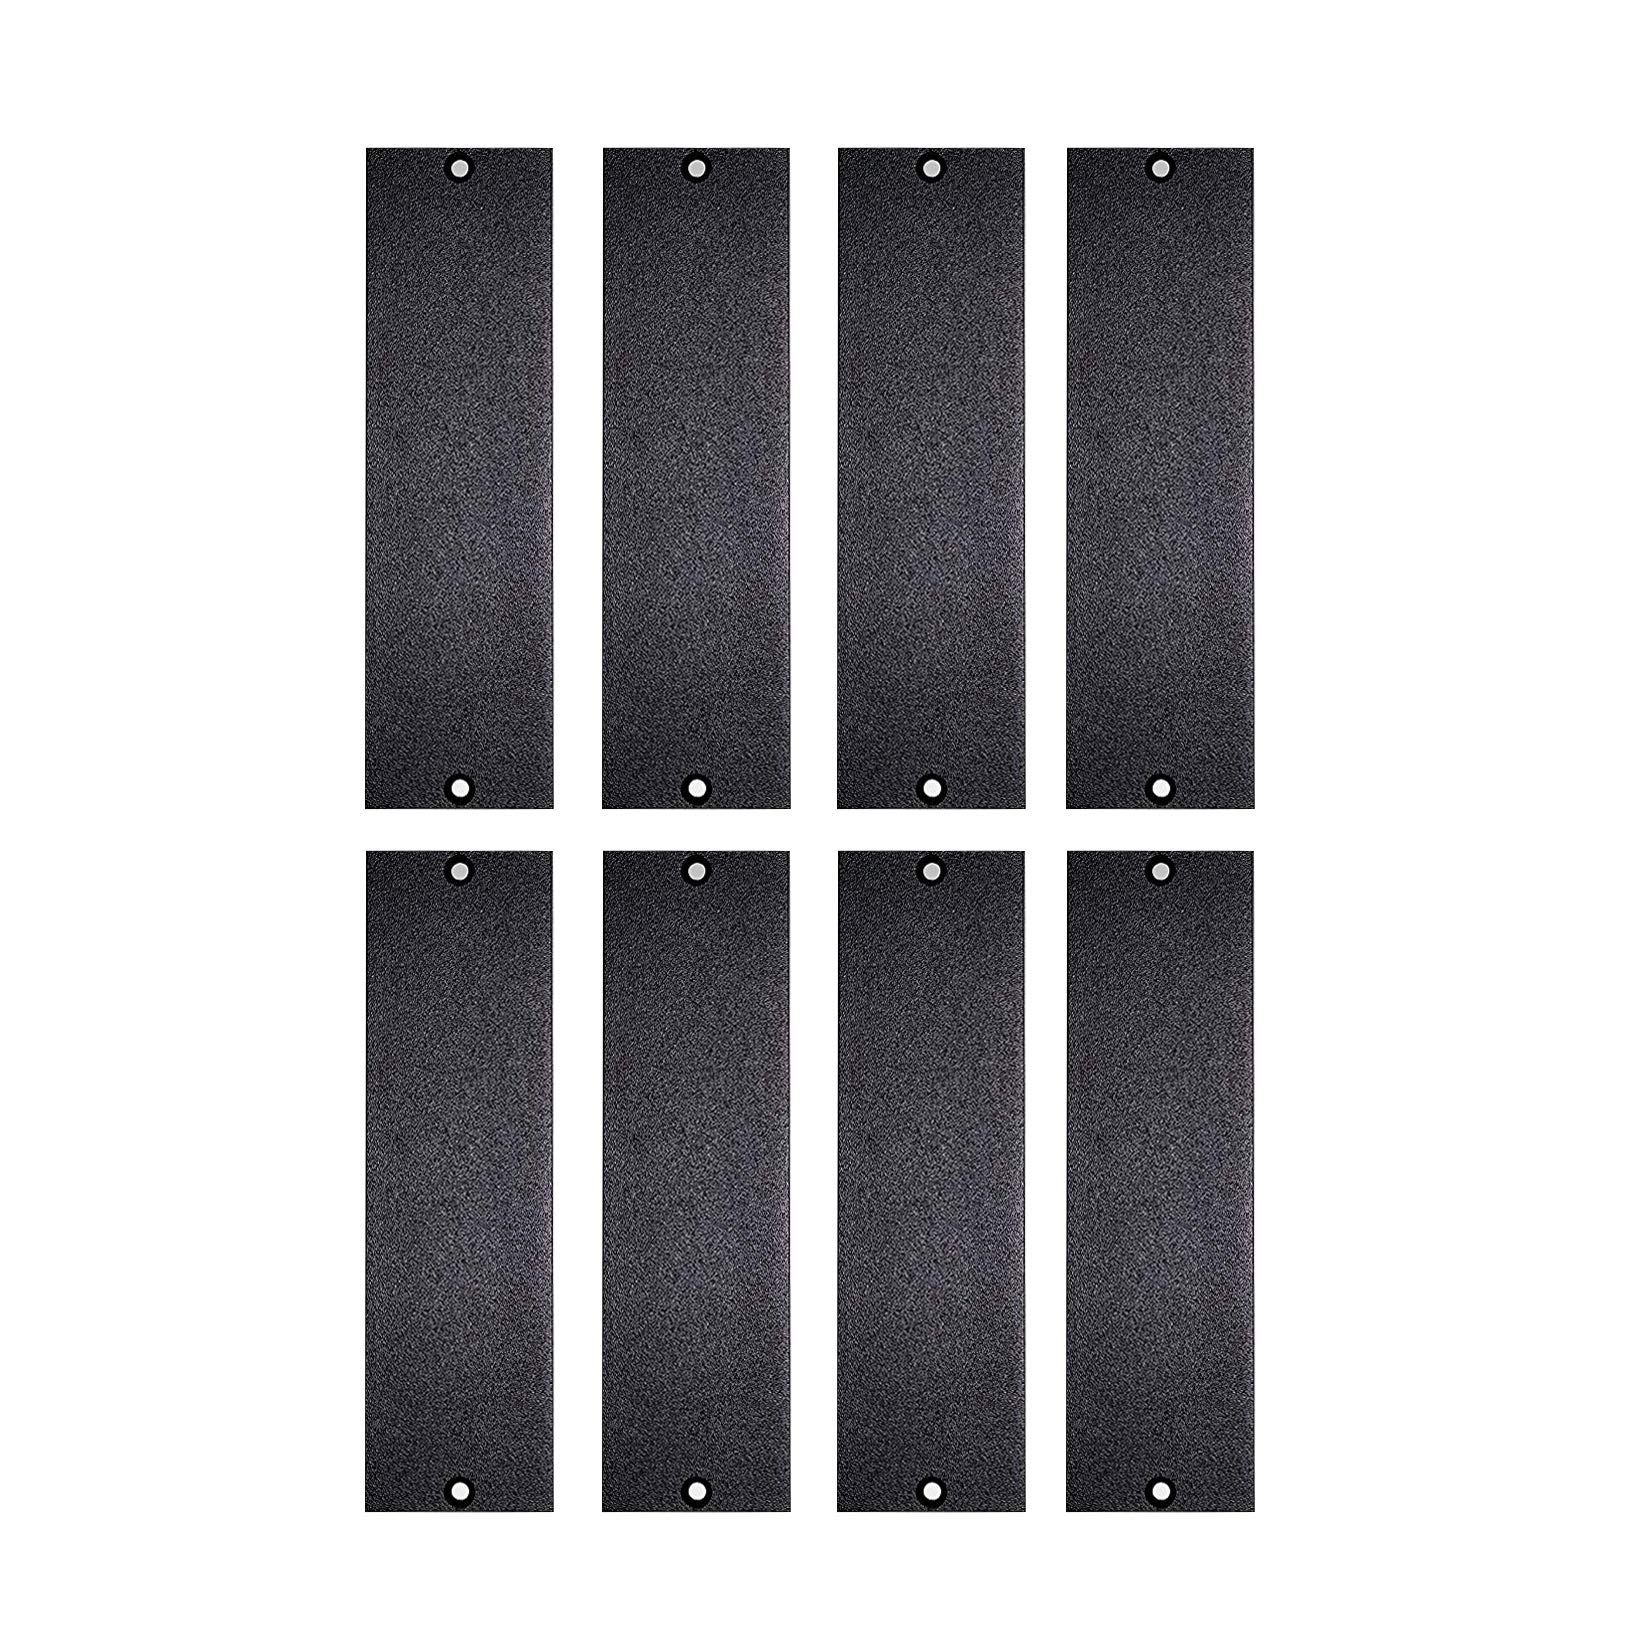 1U 500 Series Universal Blank Panel | Made in USA (8 Pack)